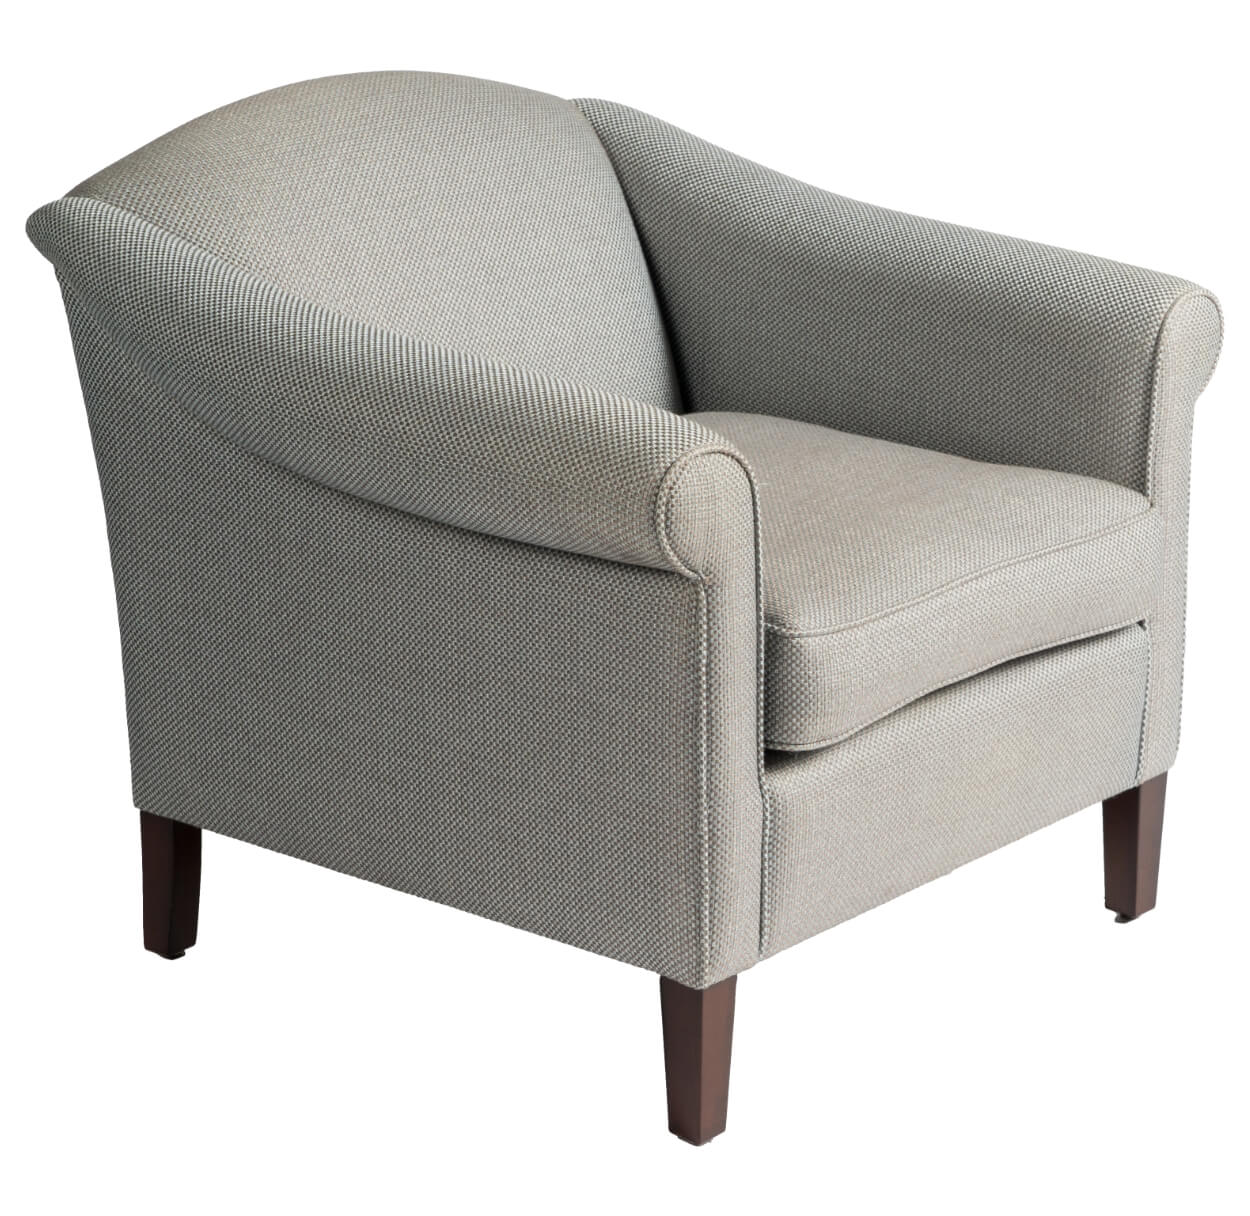 Merone fauteuil Mulleman Meubelen